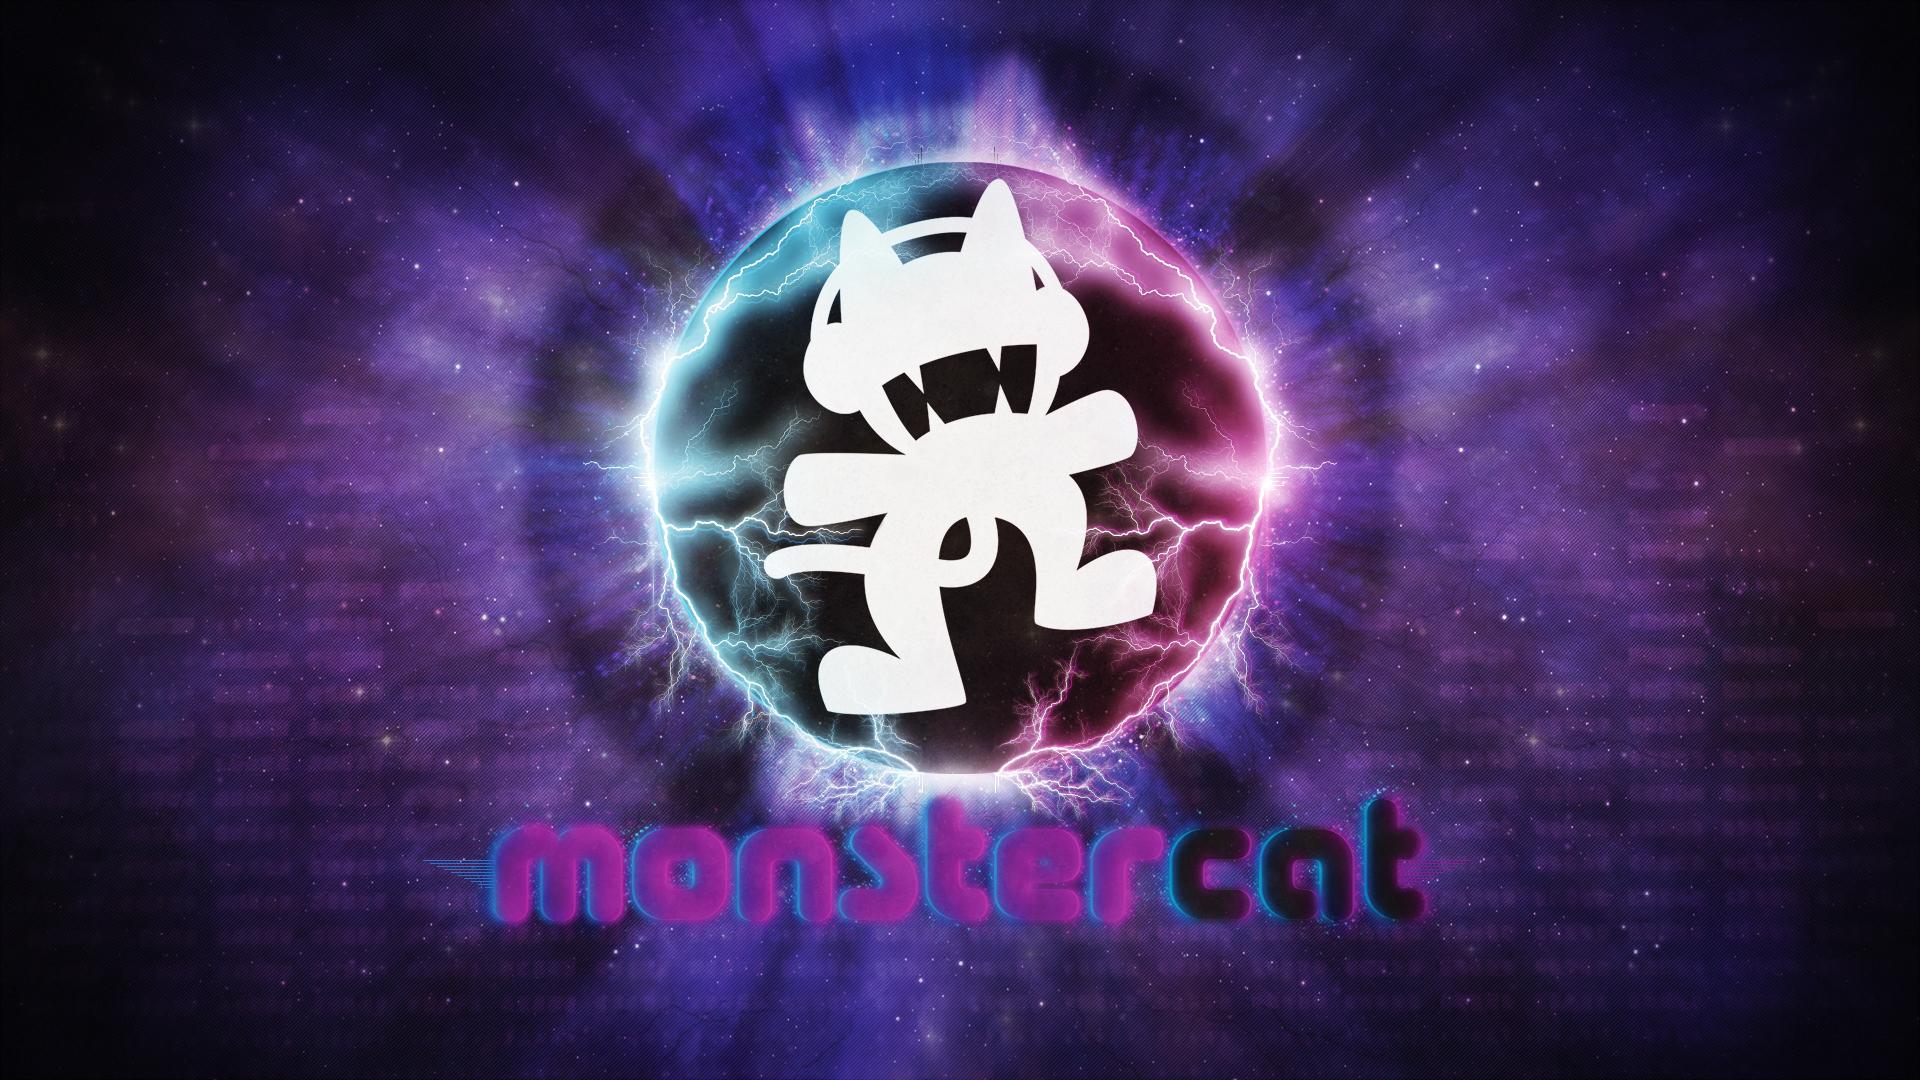 Wallpaper ~ MonsterCat. by Mackaged